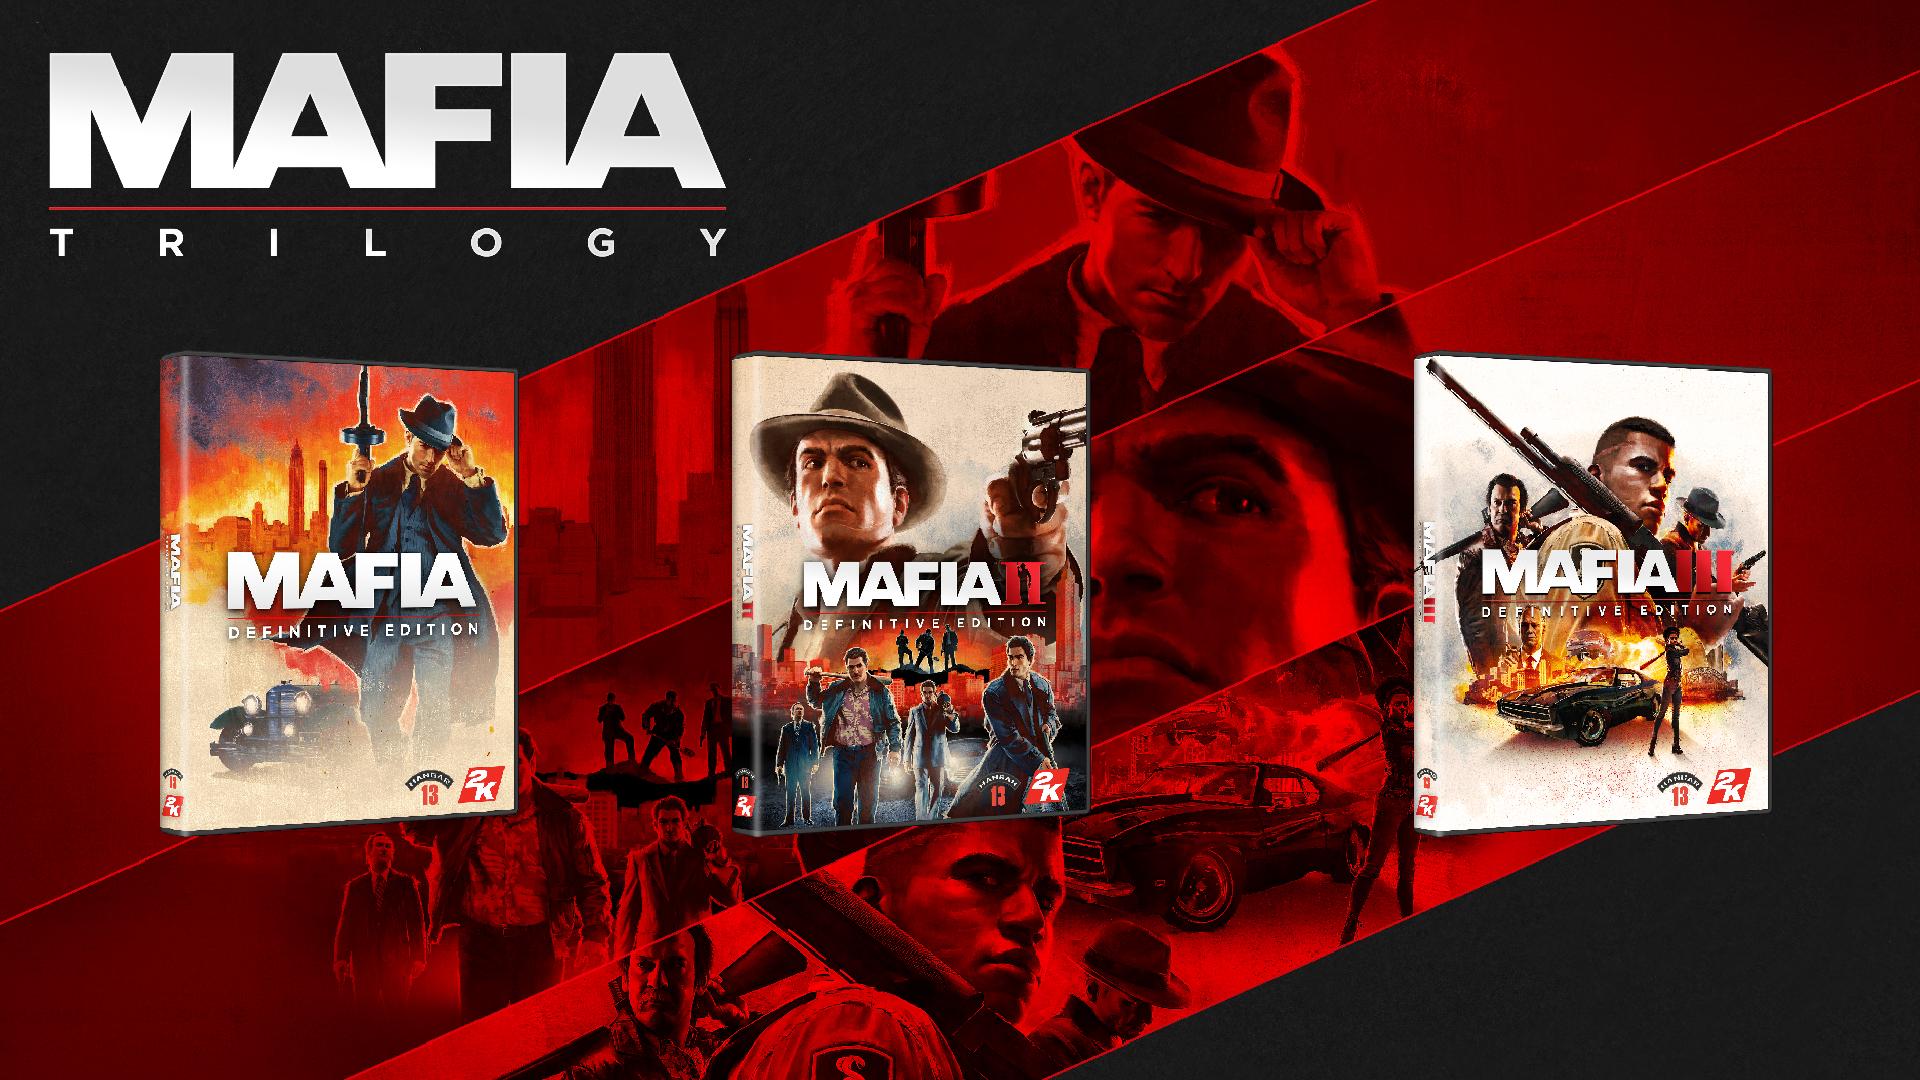 Mafia Trilogy on PC